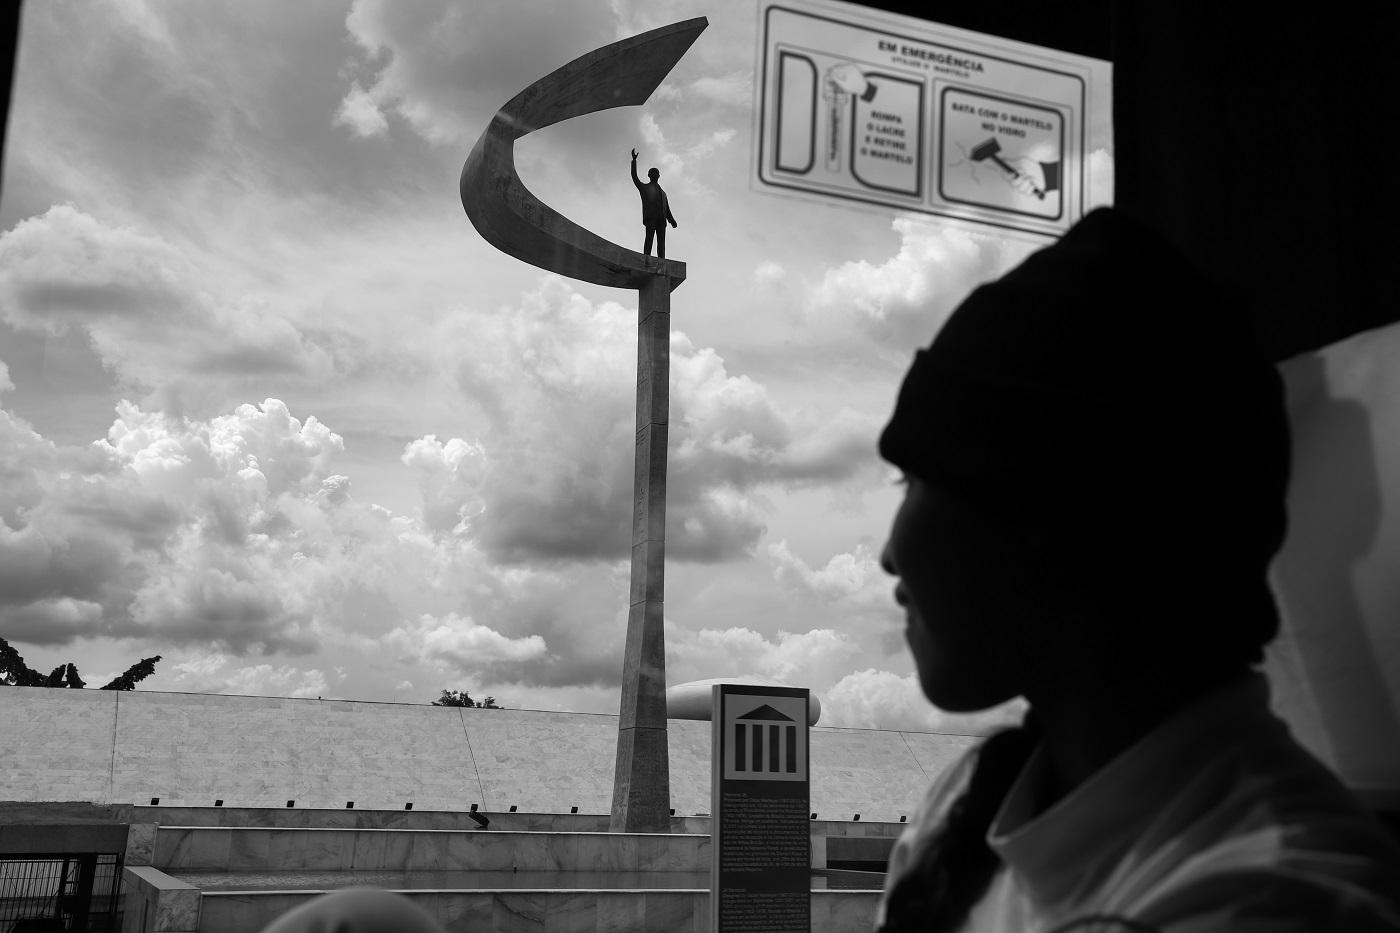 Jovem observa o Monumento JK, no Eixo Monumental de Brasília